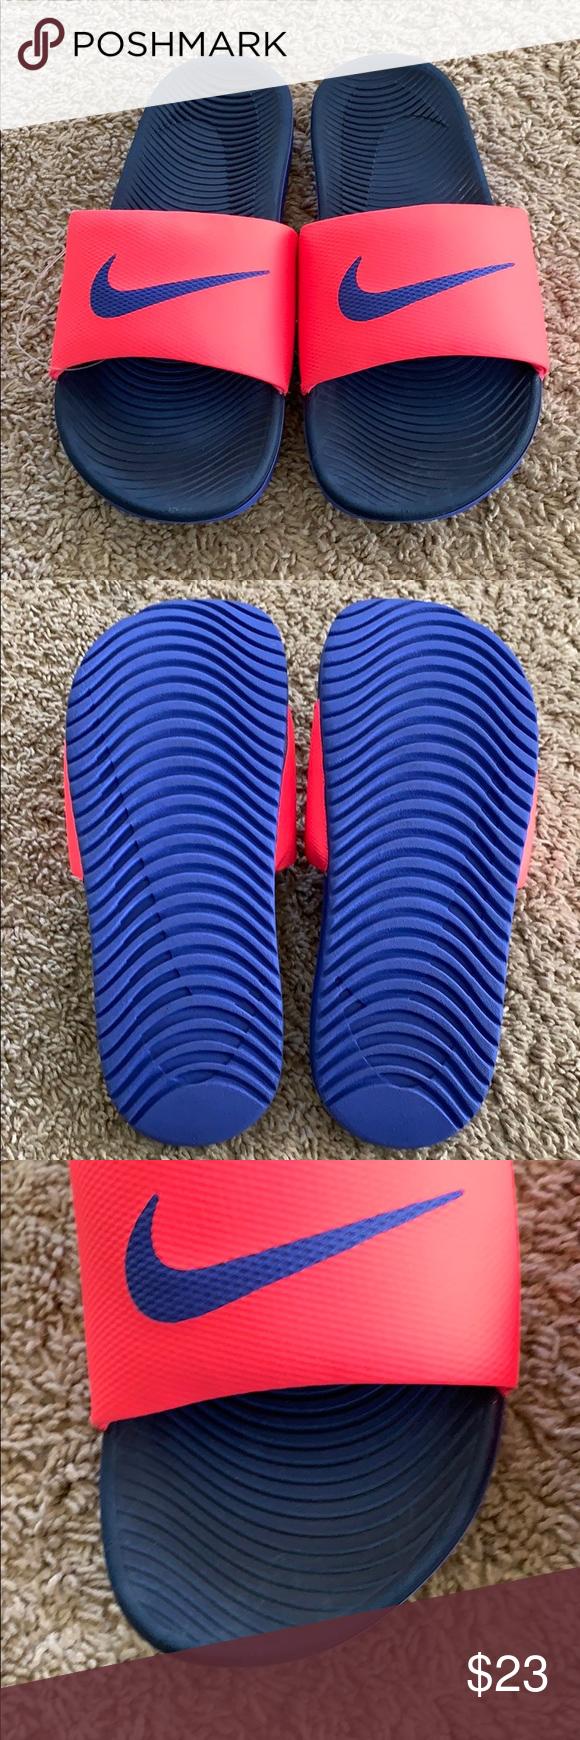 e8dc4aa5fd43 Nike Womens Kawa Slide 834588-600 Size 6 Nike Womens Kawa Slide 834588-600